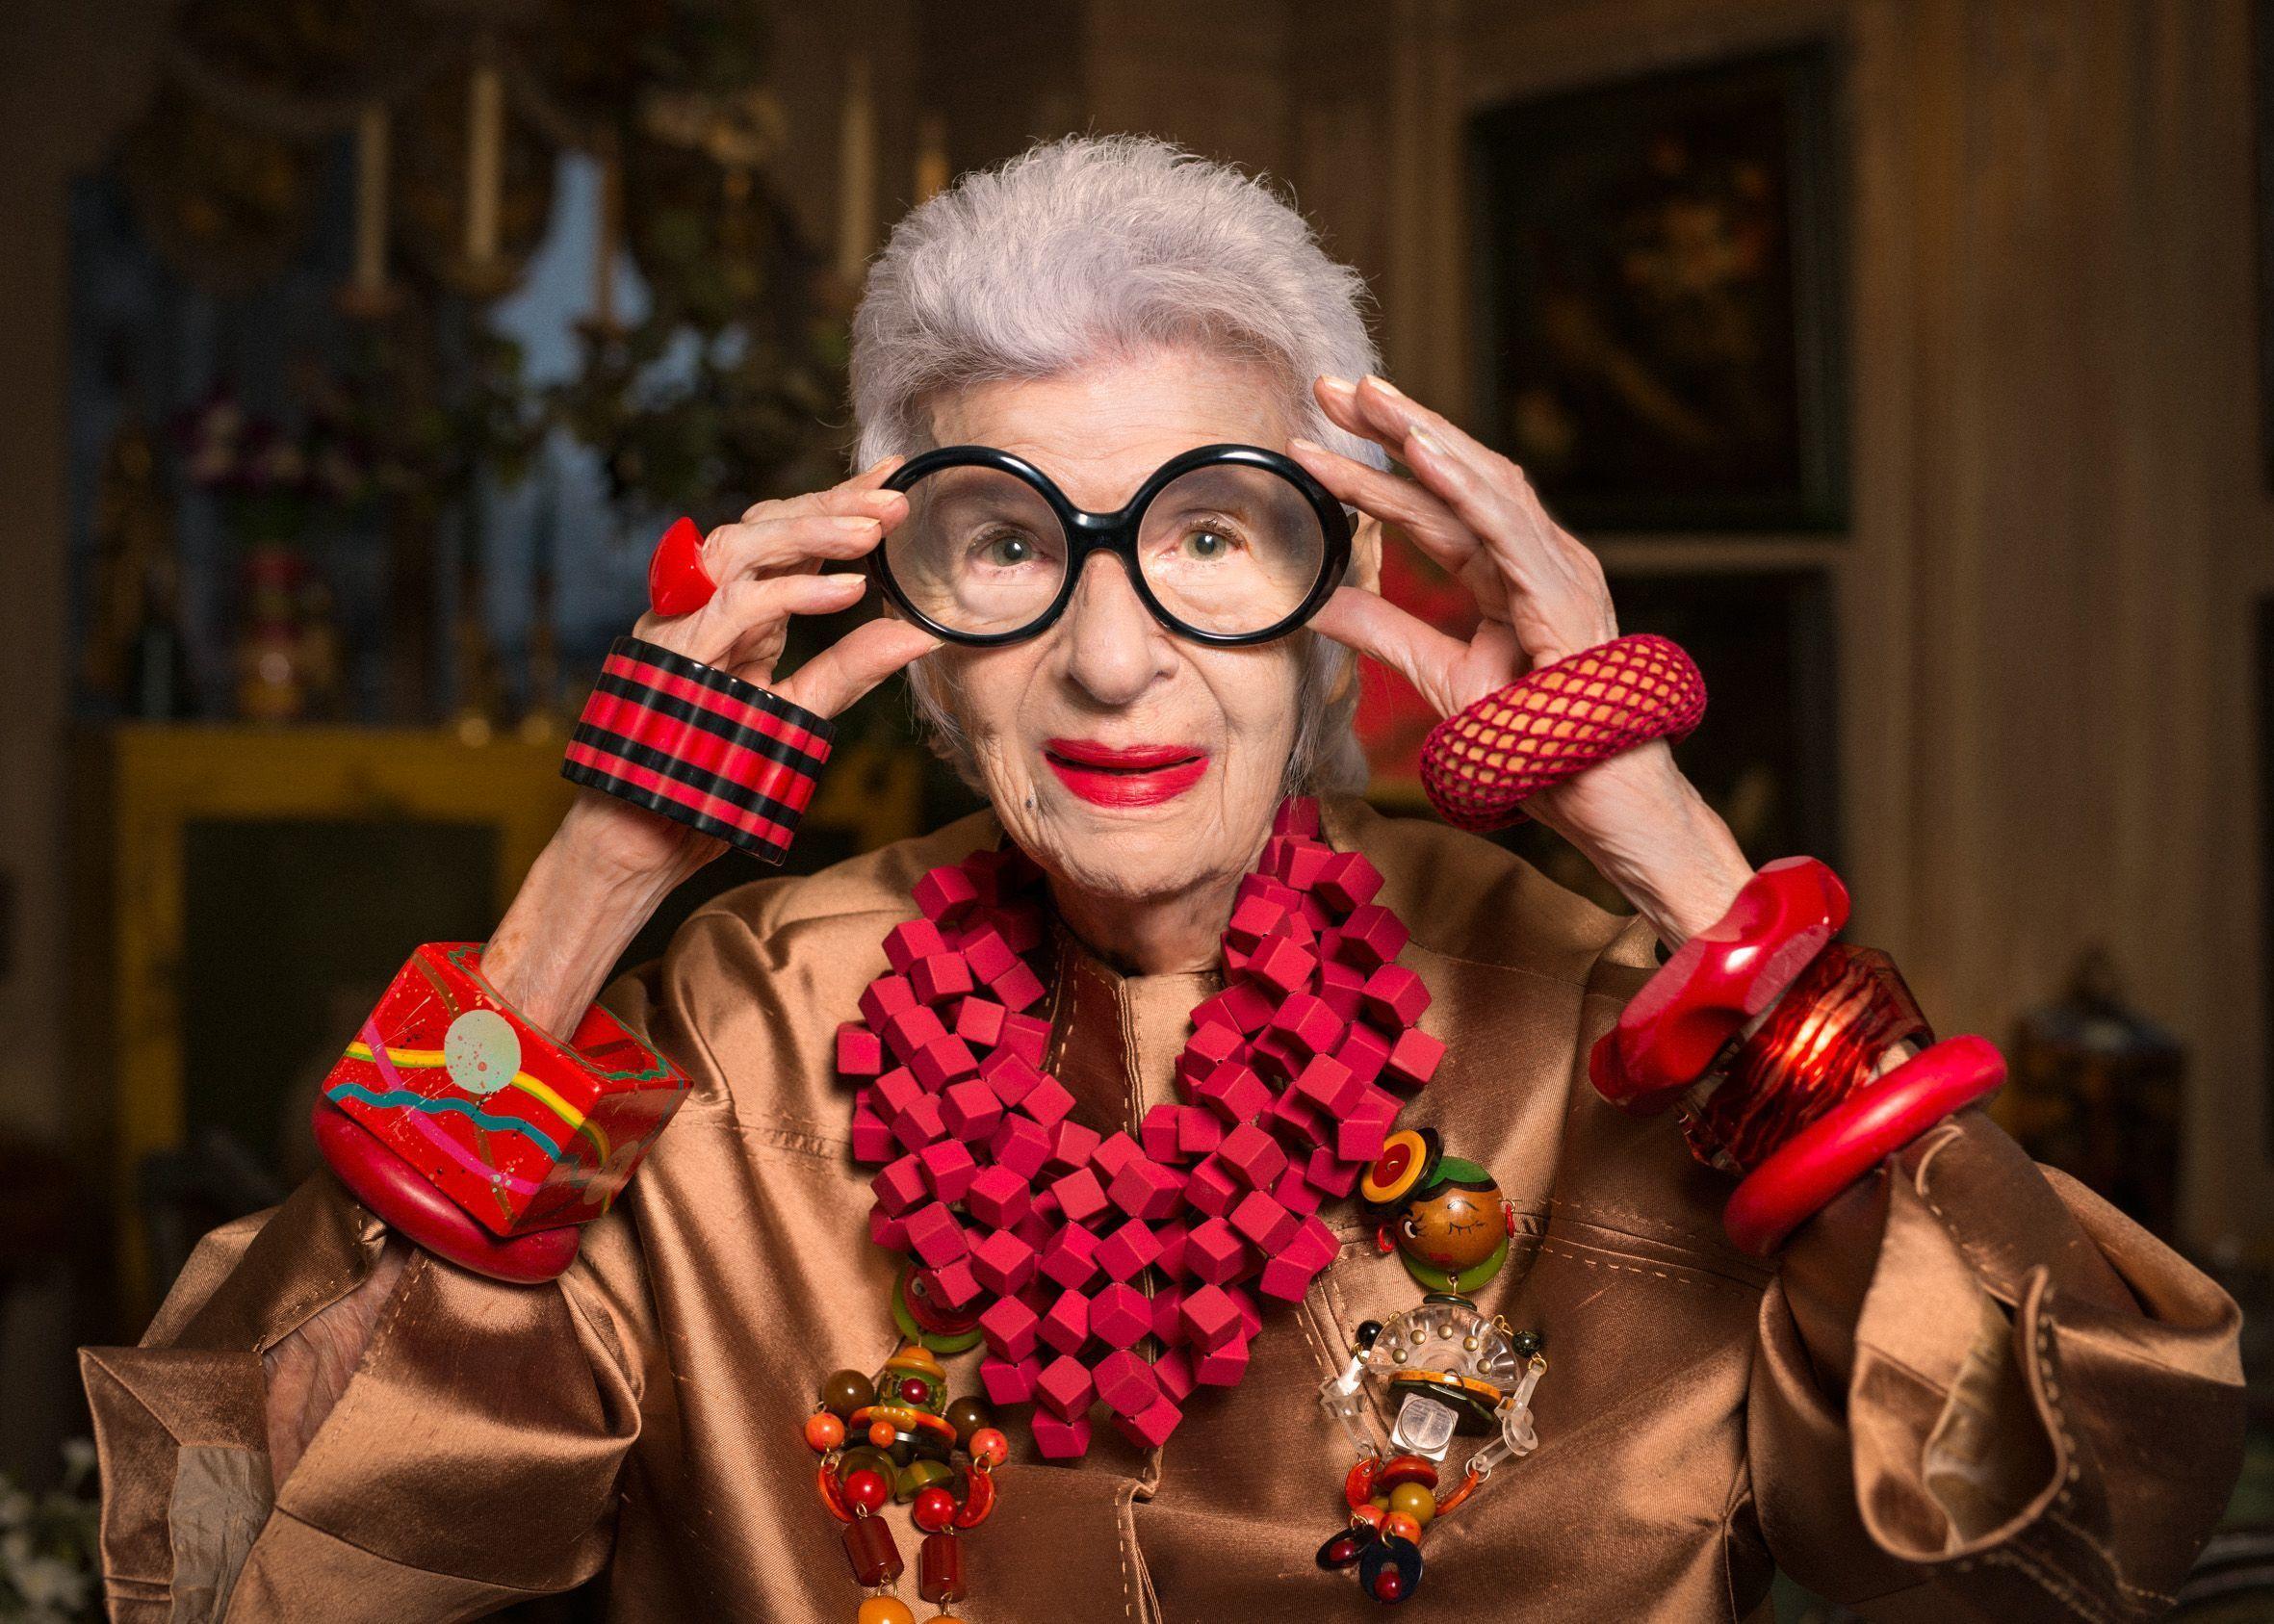 Смешное картинки бабушки, днях недели